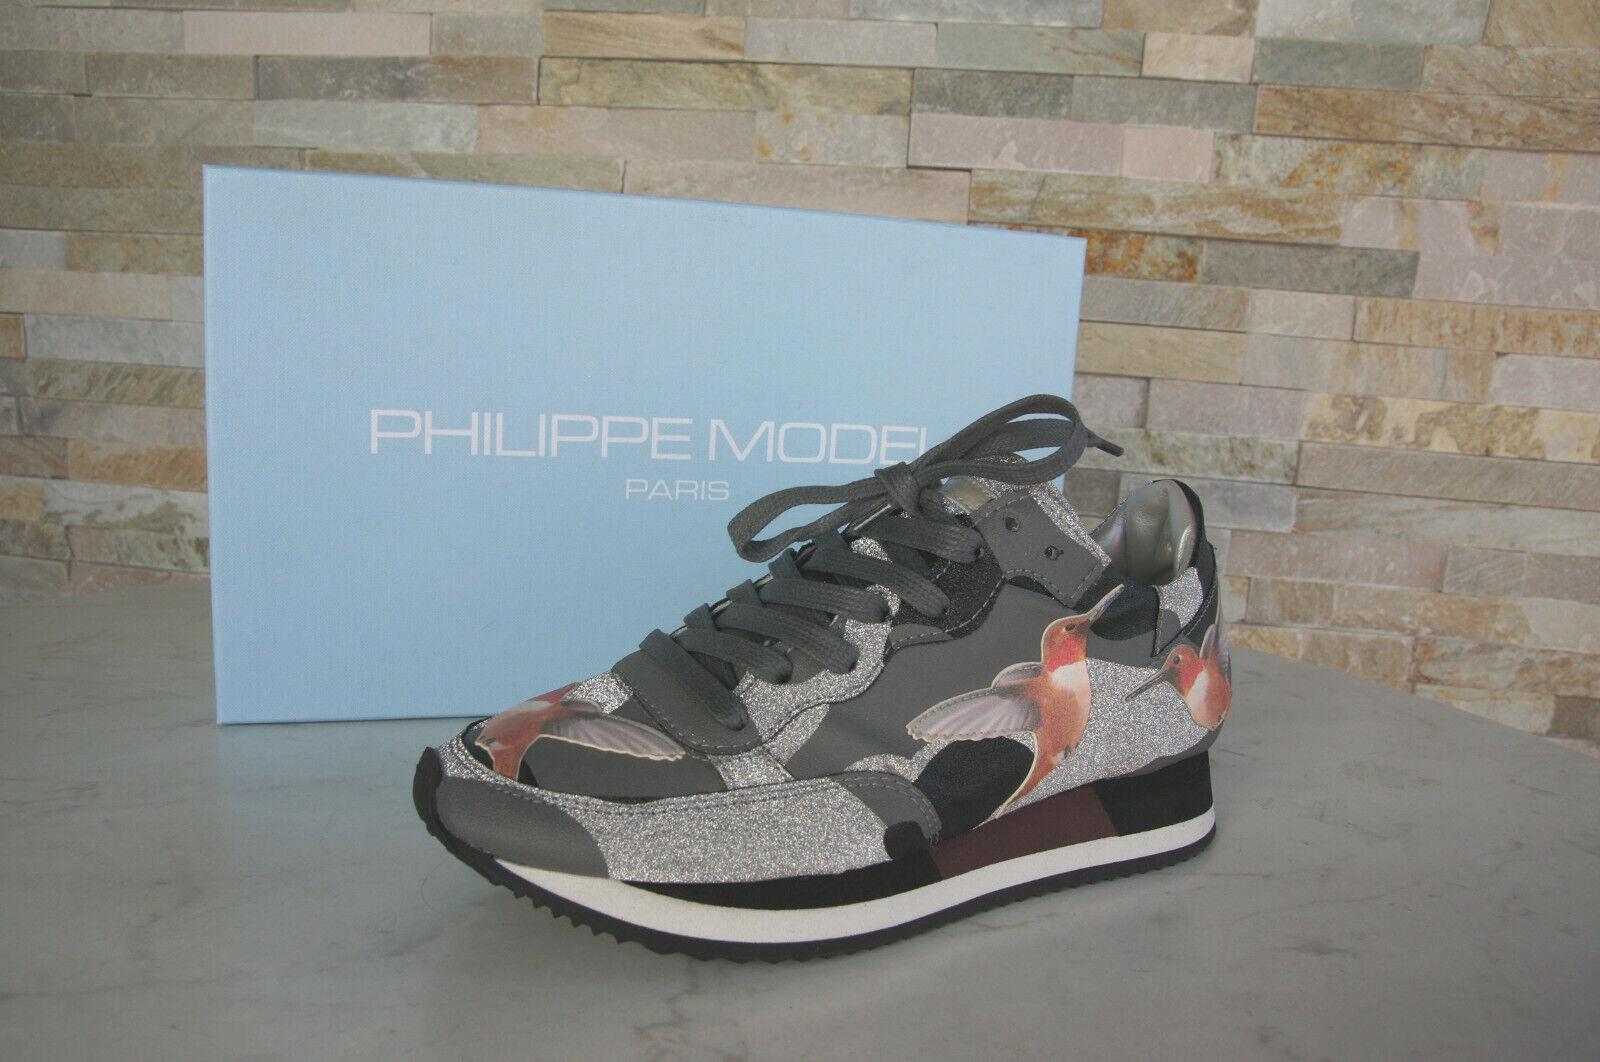 PHILIPPE MODEL Paris Gr 40 Turnschuhe TBLD Schuhe ETOILE grau NEU ehem